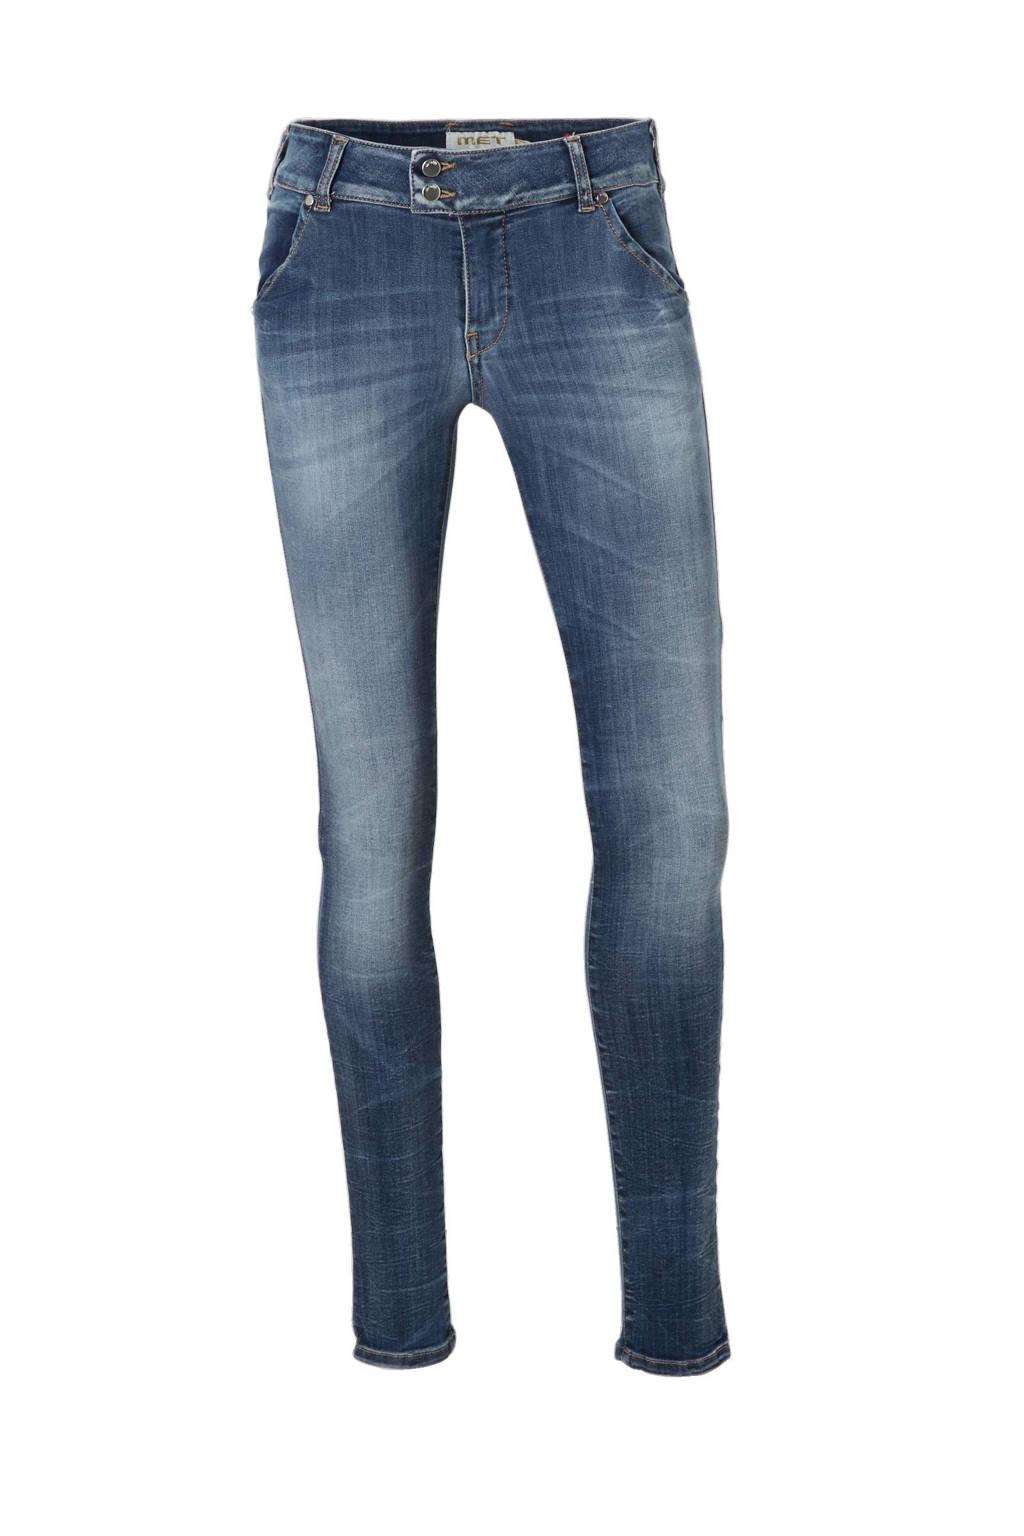 6c054f2b734 X-H-K-FIT/O D1061 medium waist skinny fit jeans